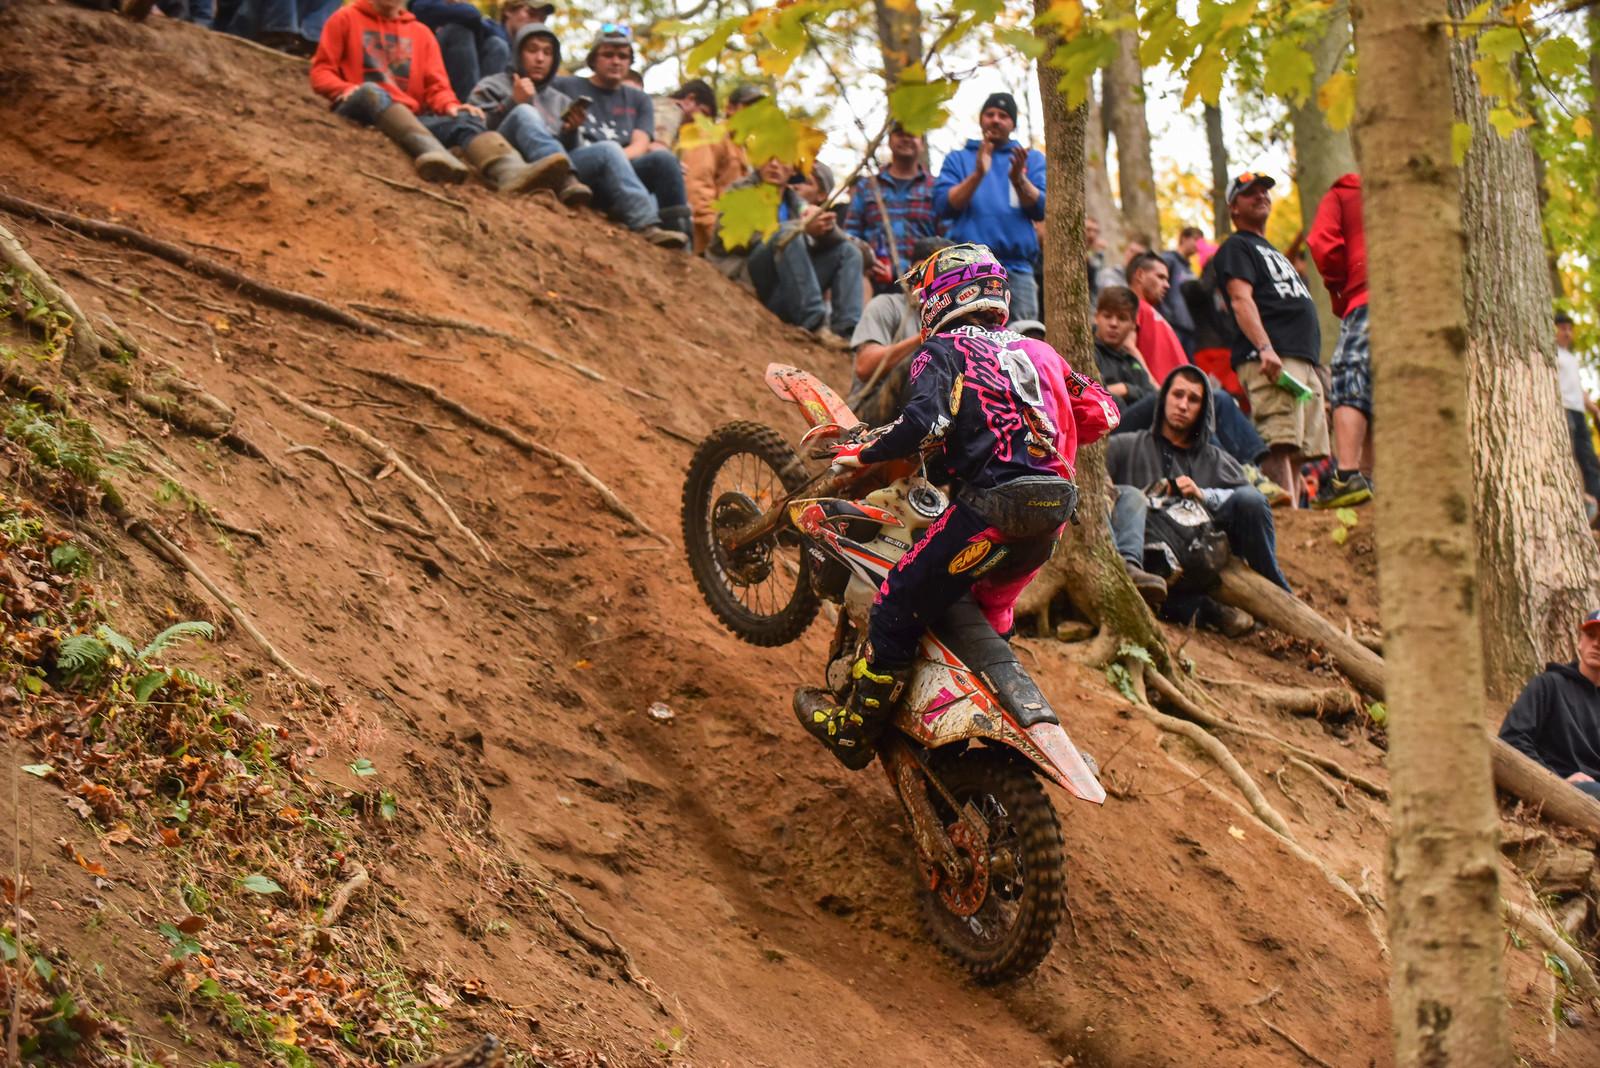 Kailub Russell - Ironman GNCC - Motocross Pictures - Vital MX